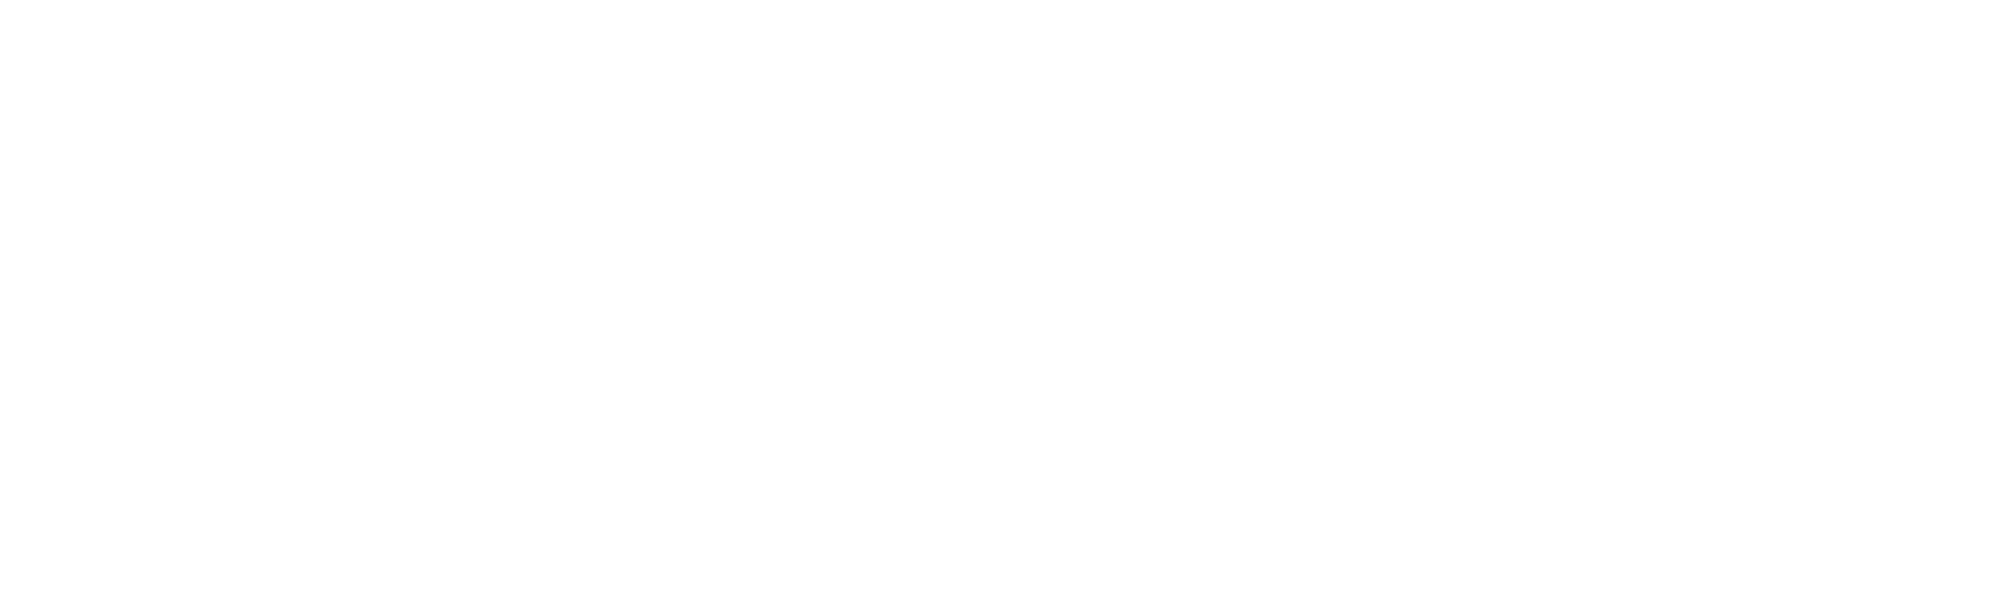 North Street Christian Church